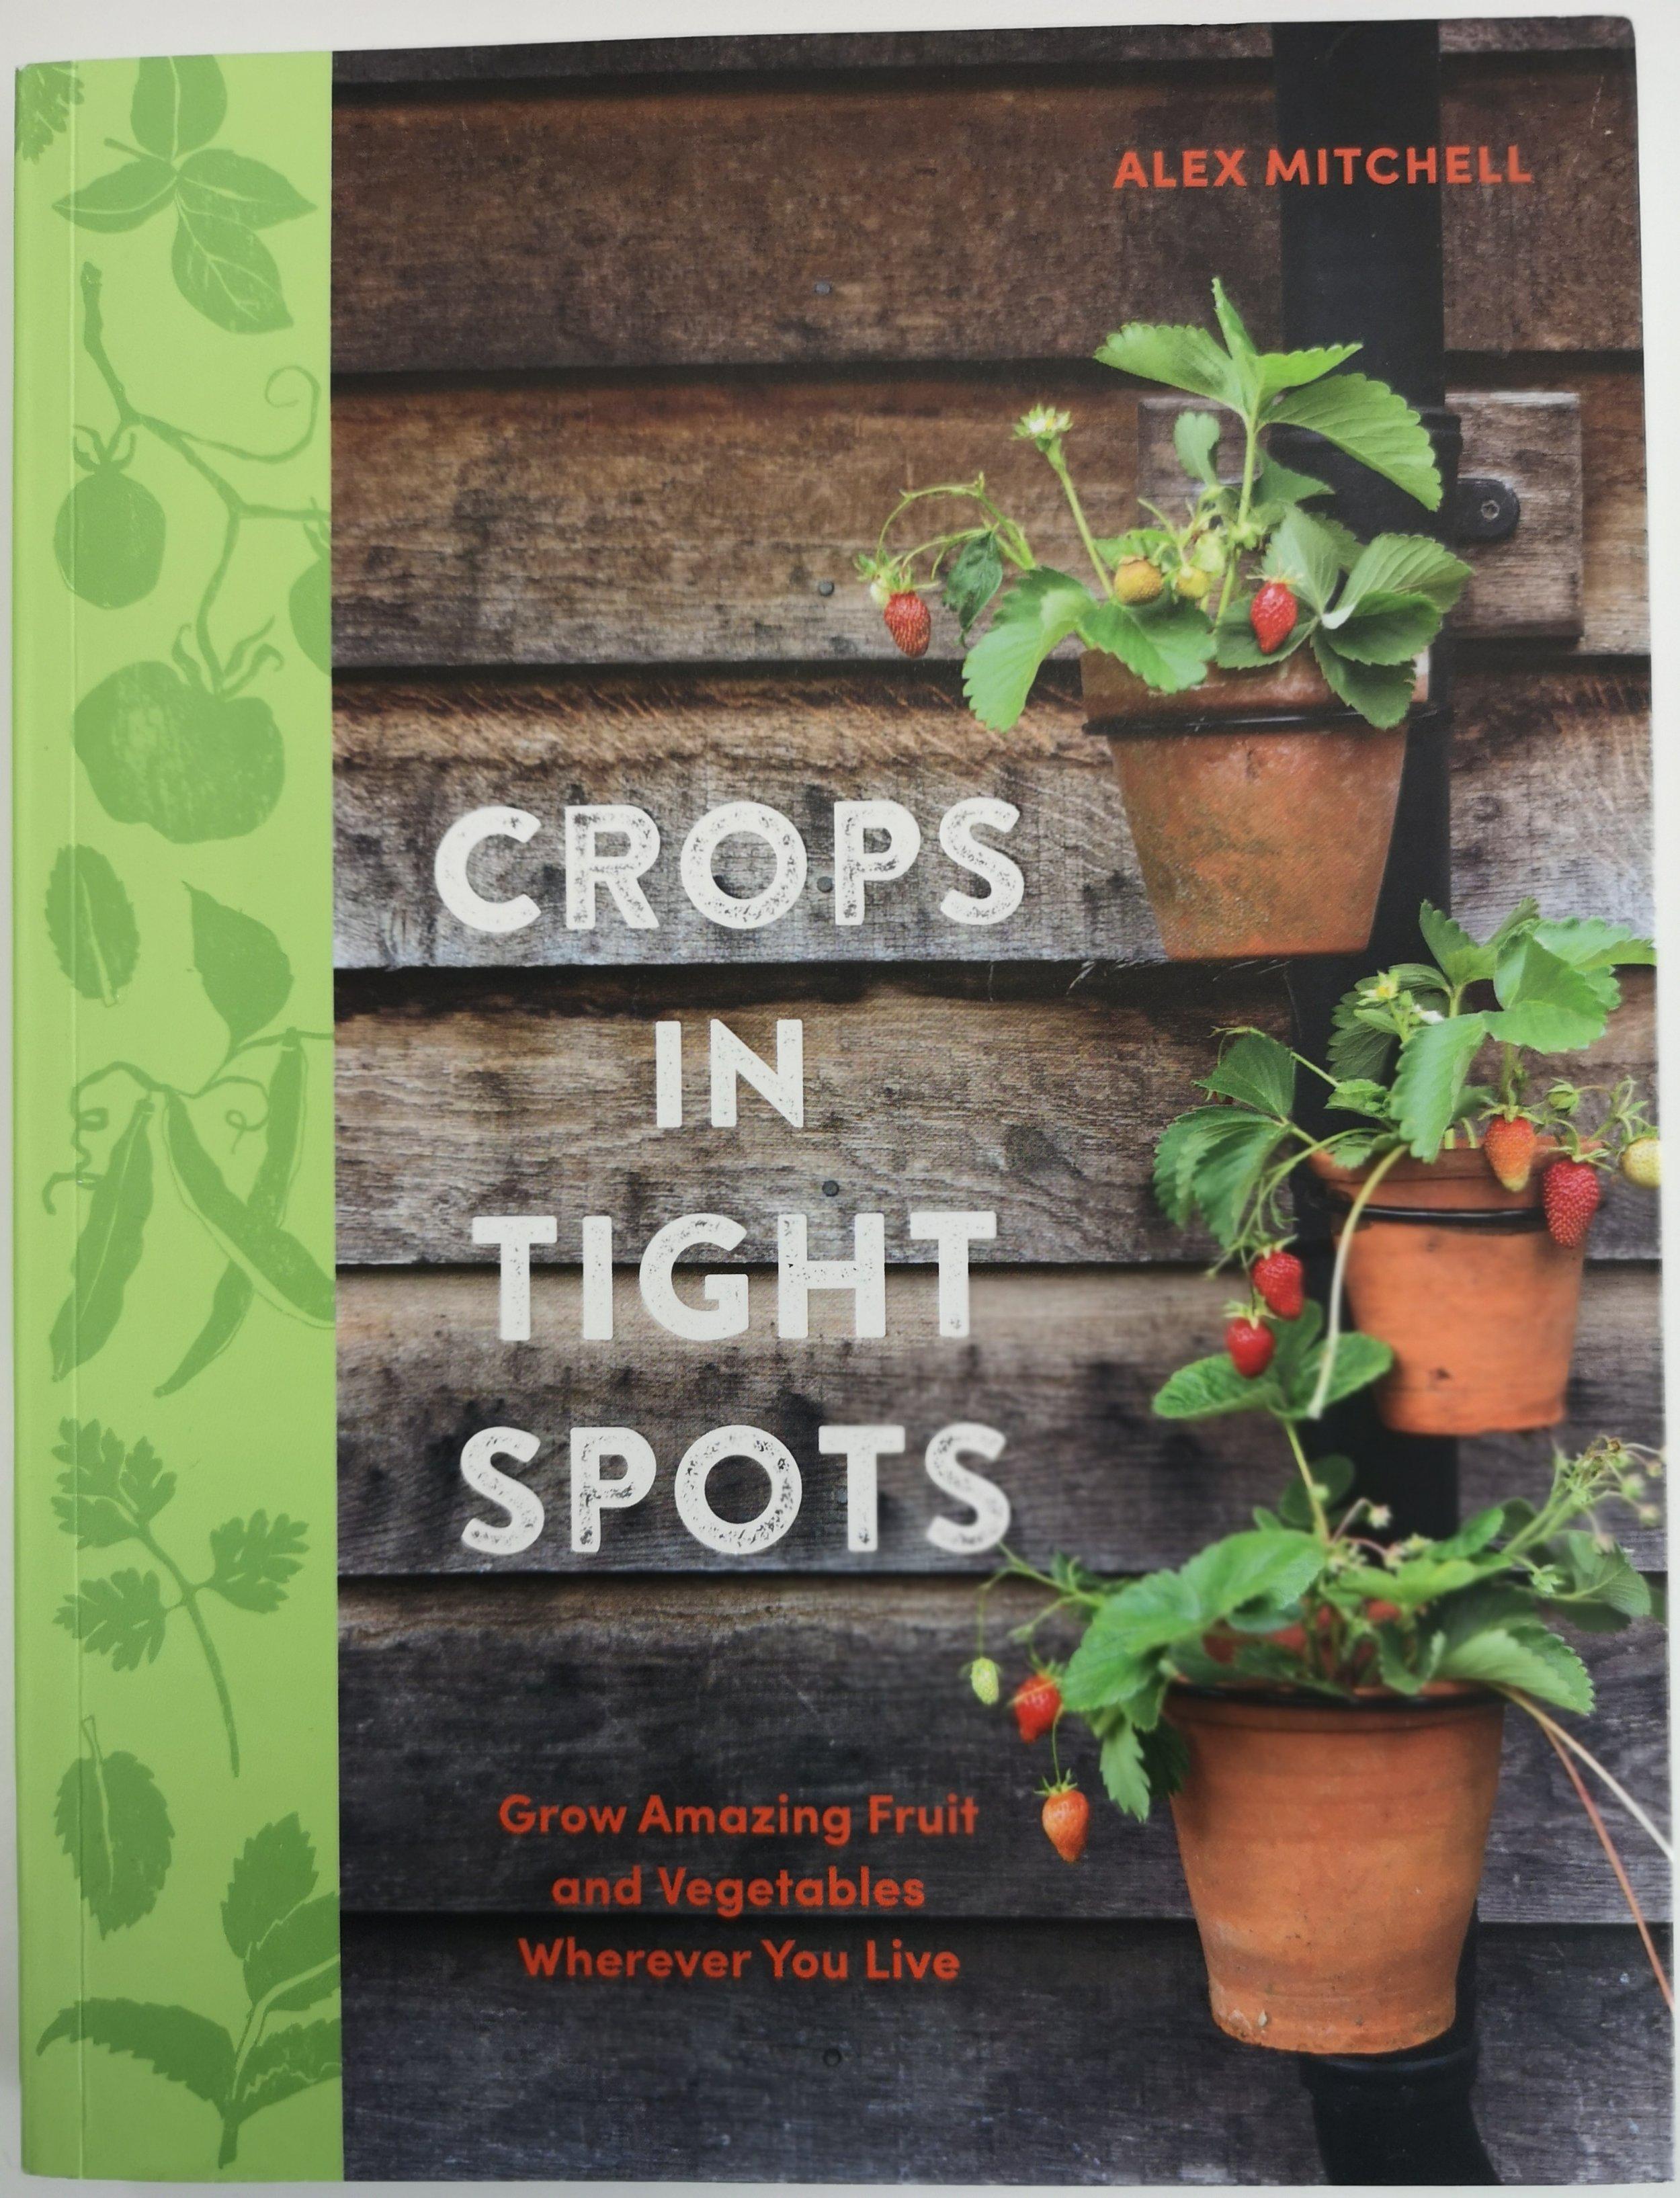 Alex Mitchell: Crops in Tight Spots